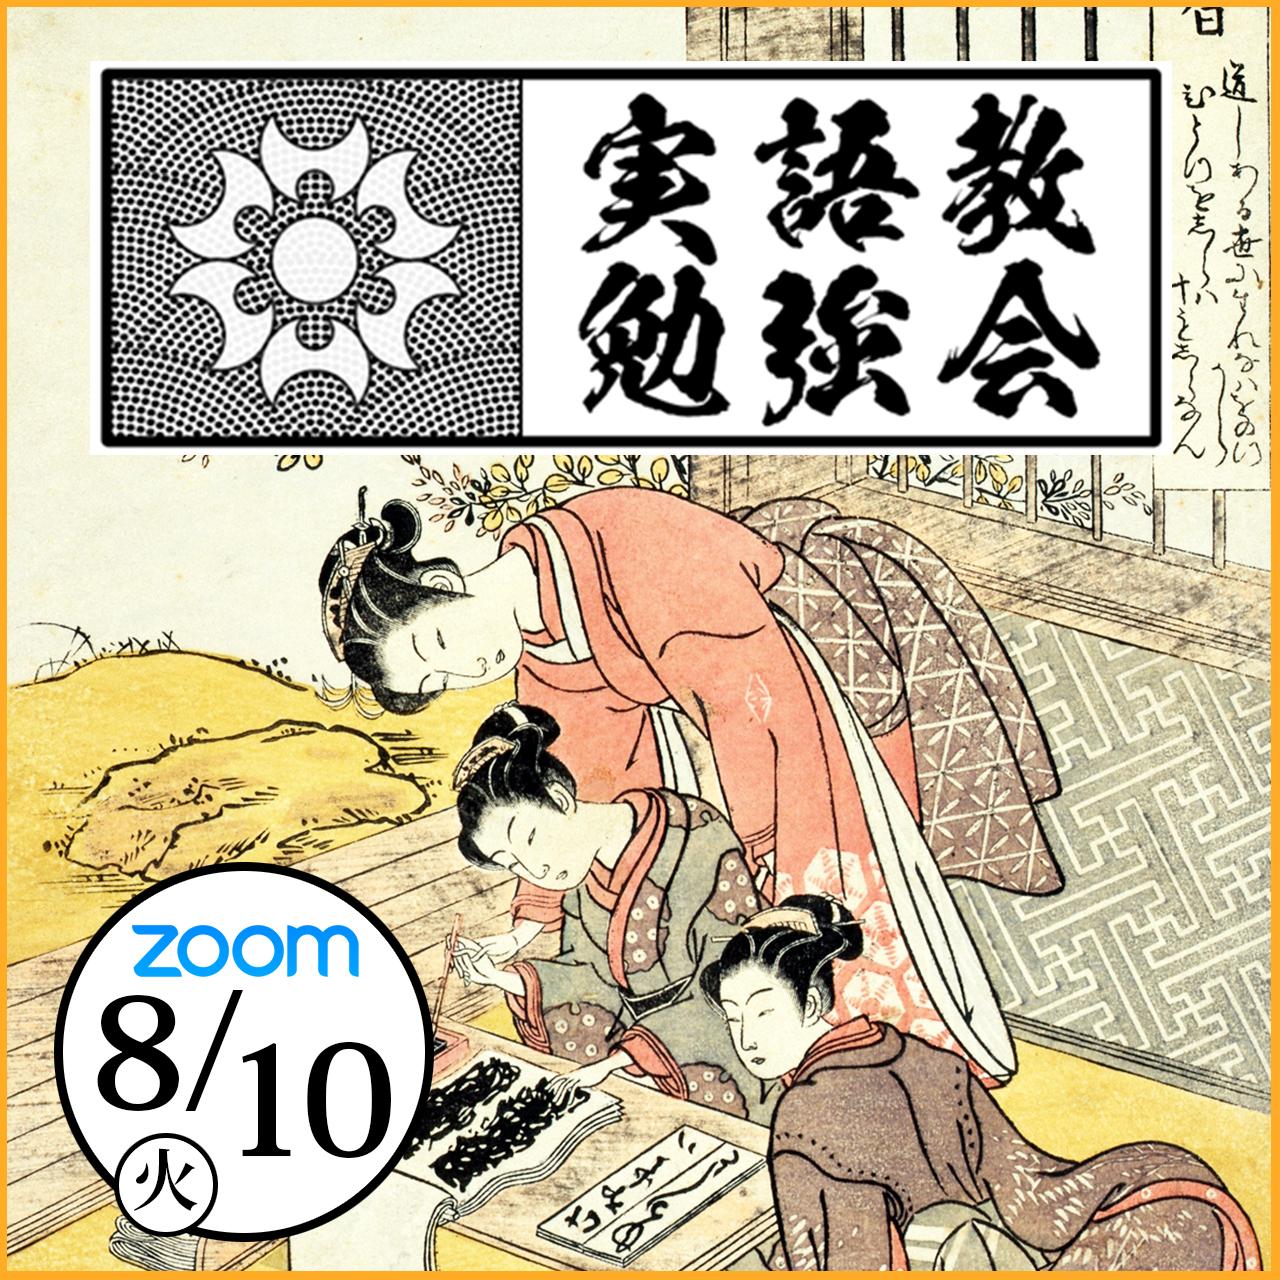 【WU受講生限定】実語教オンライン勉強会 2021年8月10日